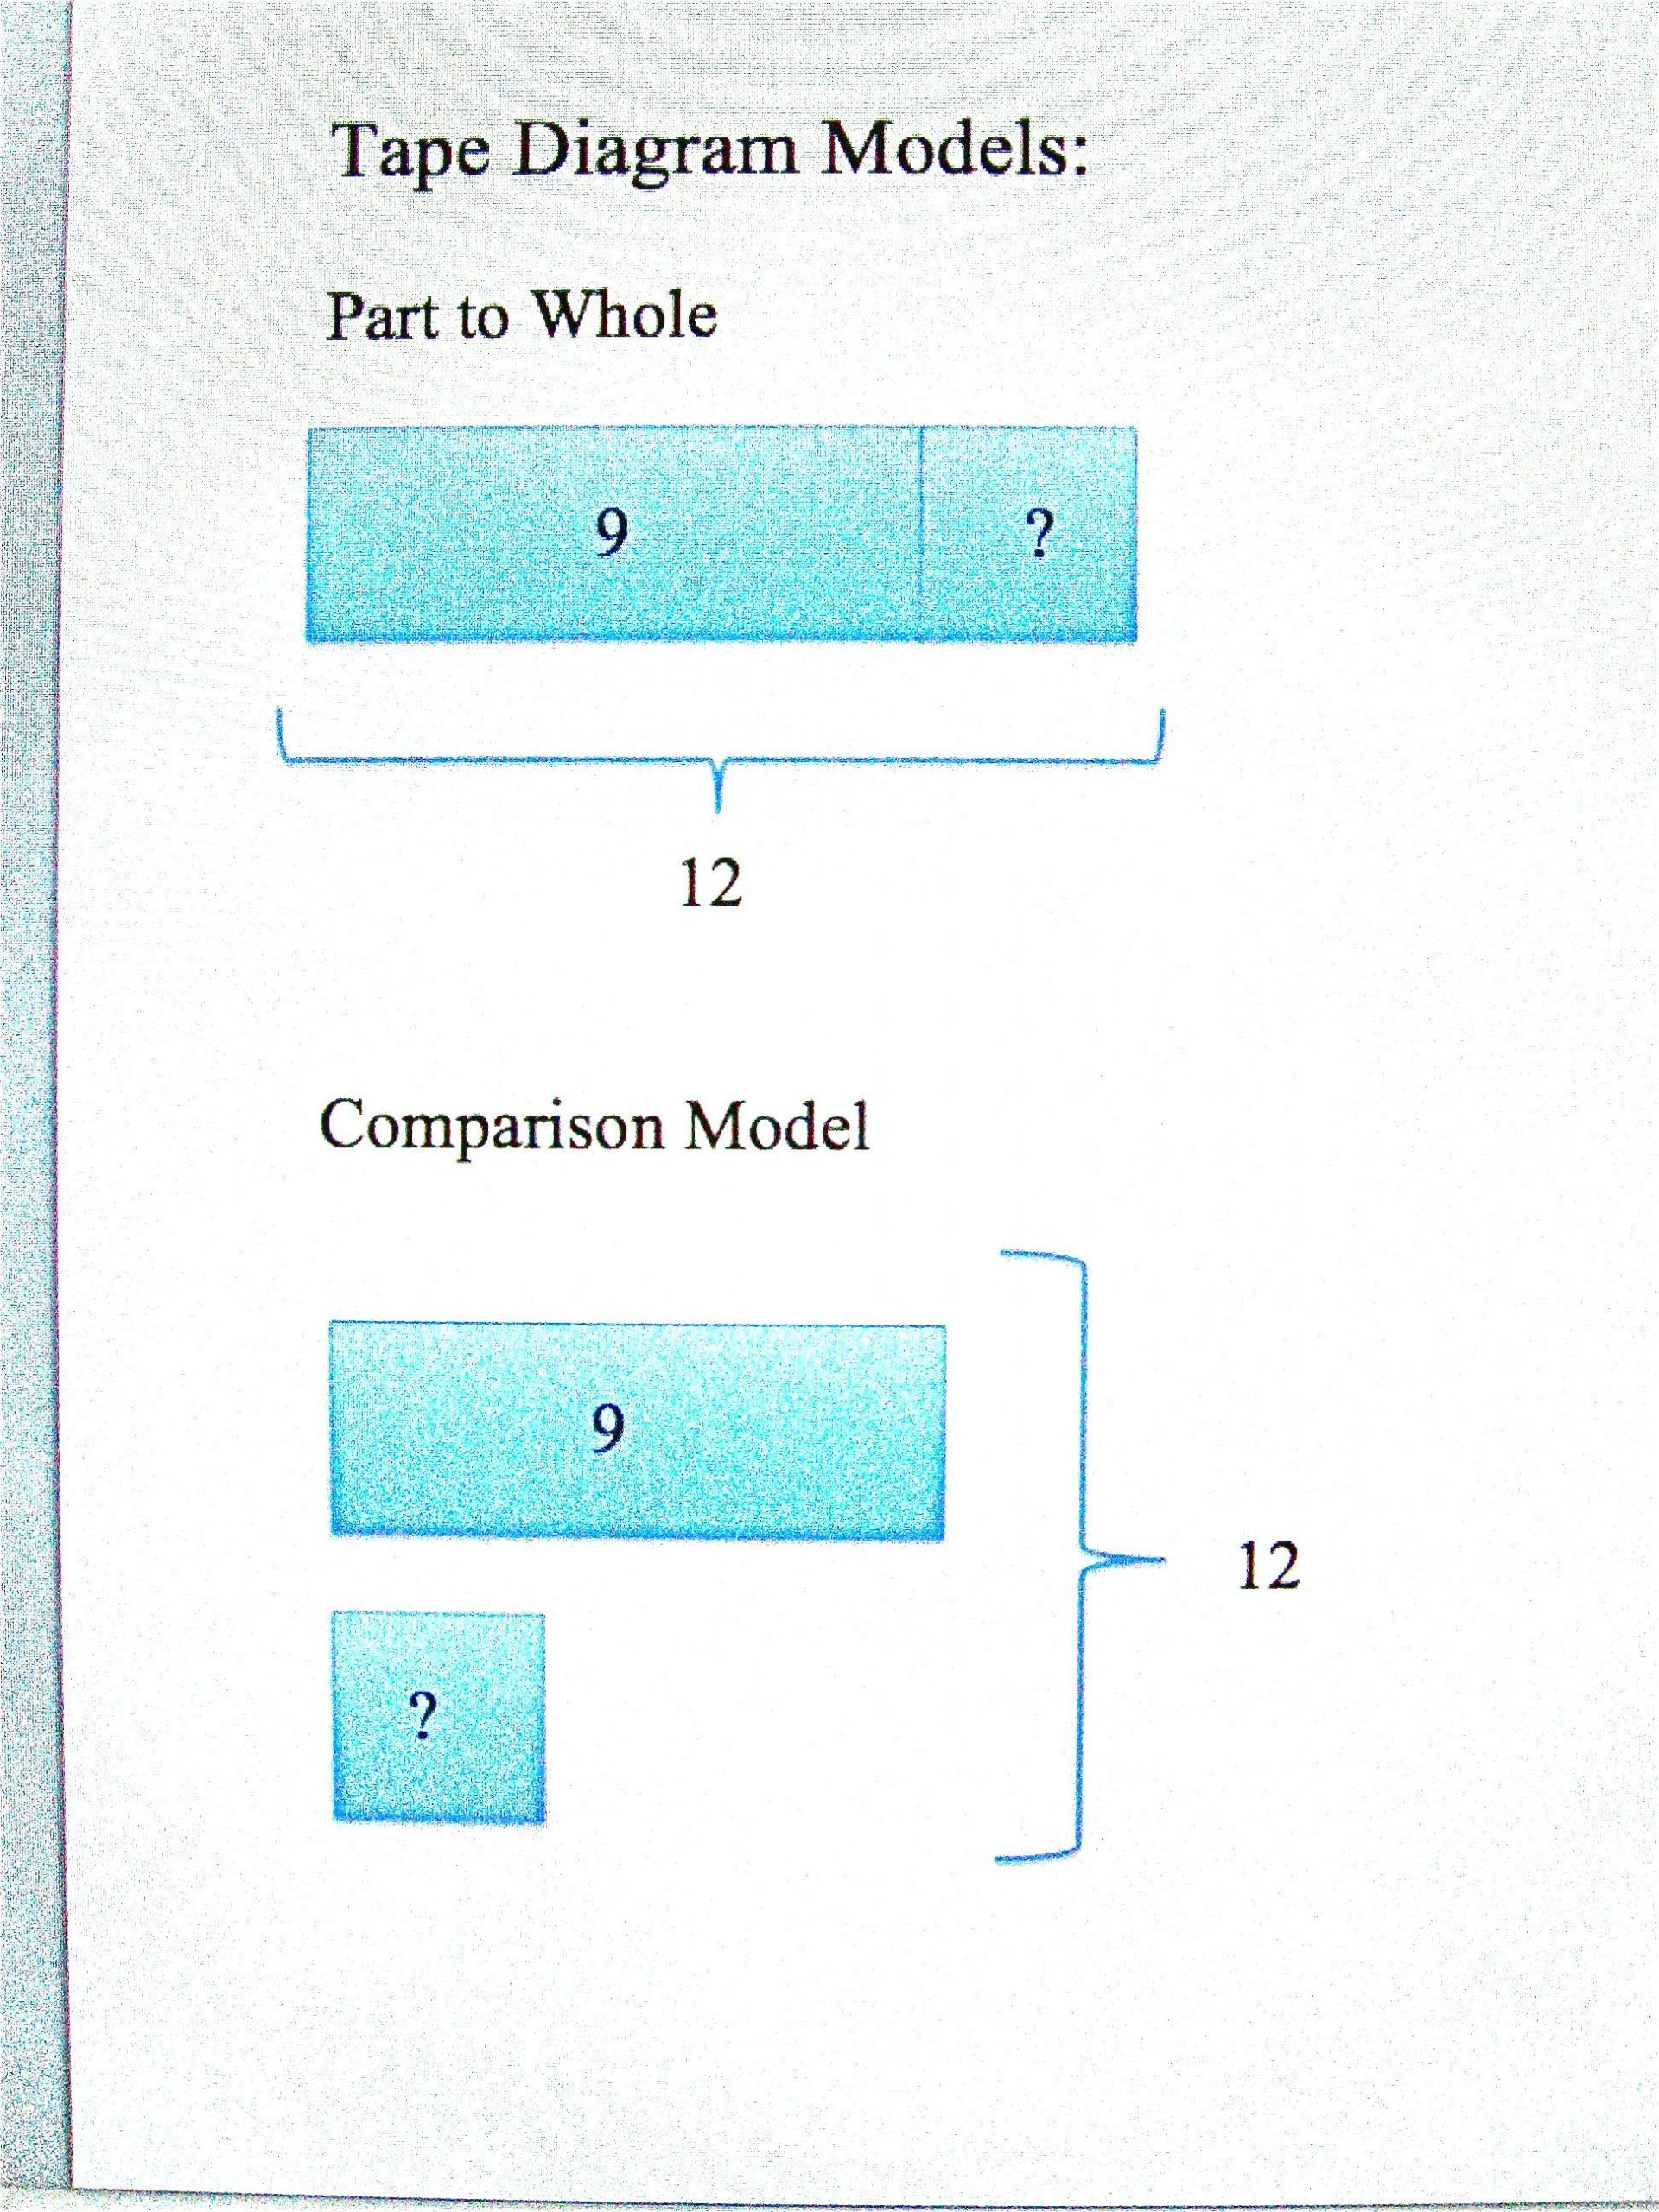 Tape Diagram Worksheet 3rd Grade Tape Diagram Models Part To Whole Parison Models Letter Recognition Worksheets Differentiation Math 2nd Grade Math